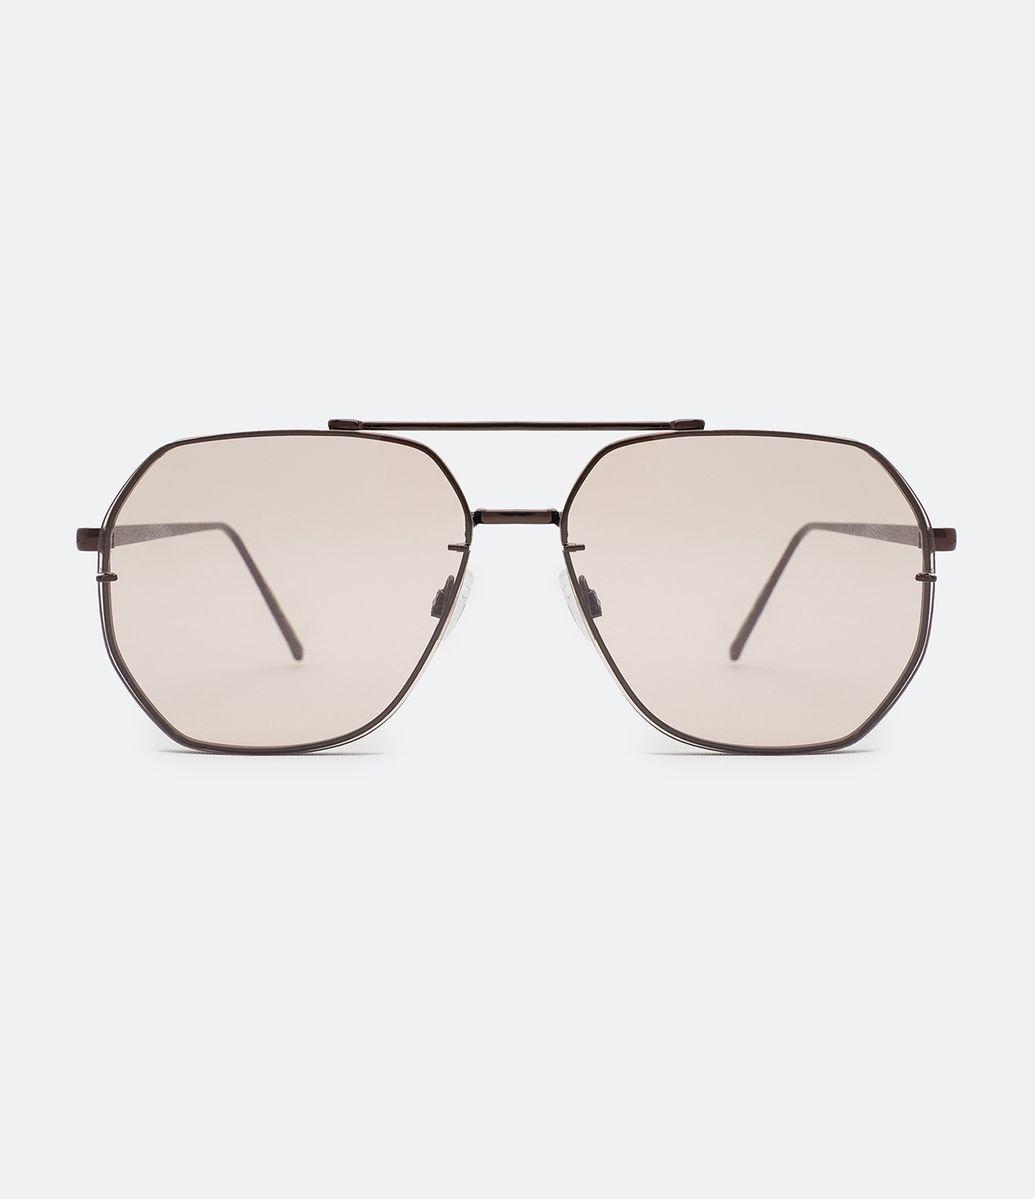 0a7a55467 Óculos de Sol Feminino Aviador - Renner